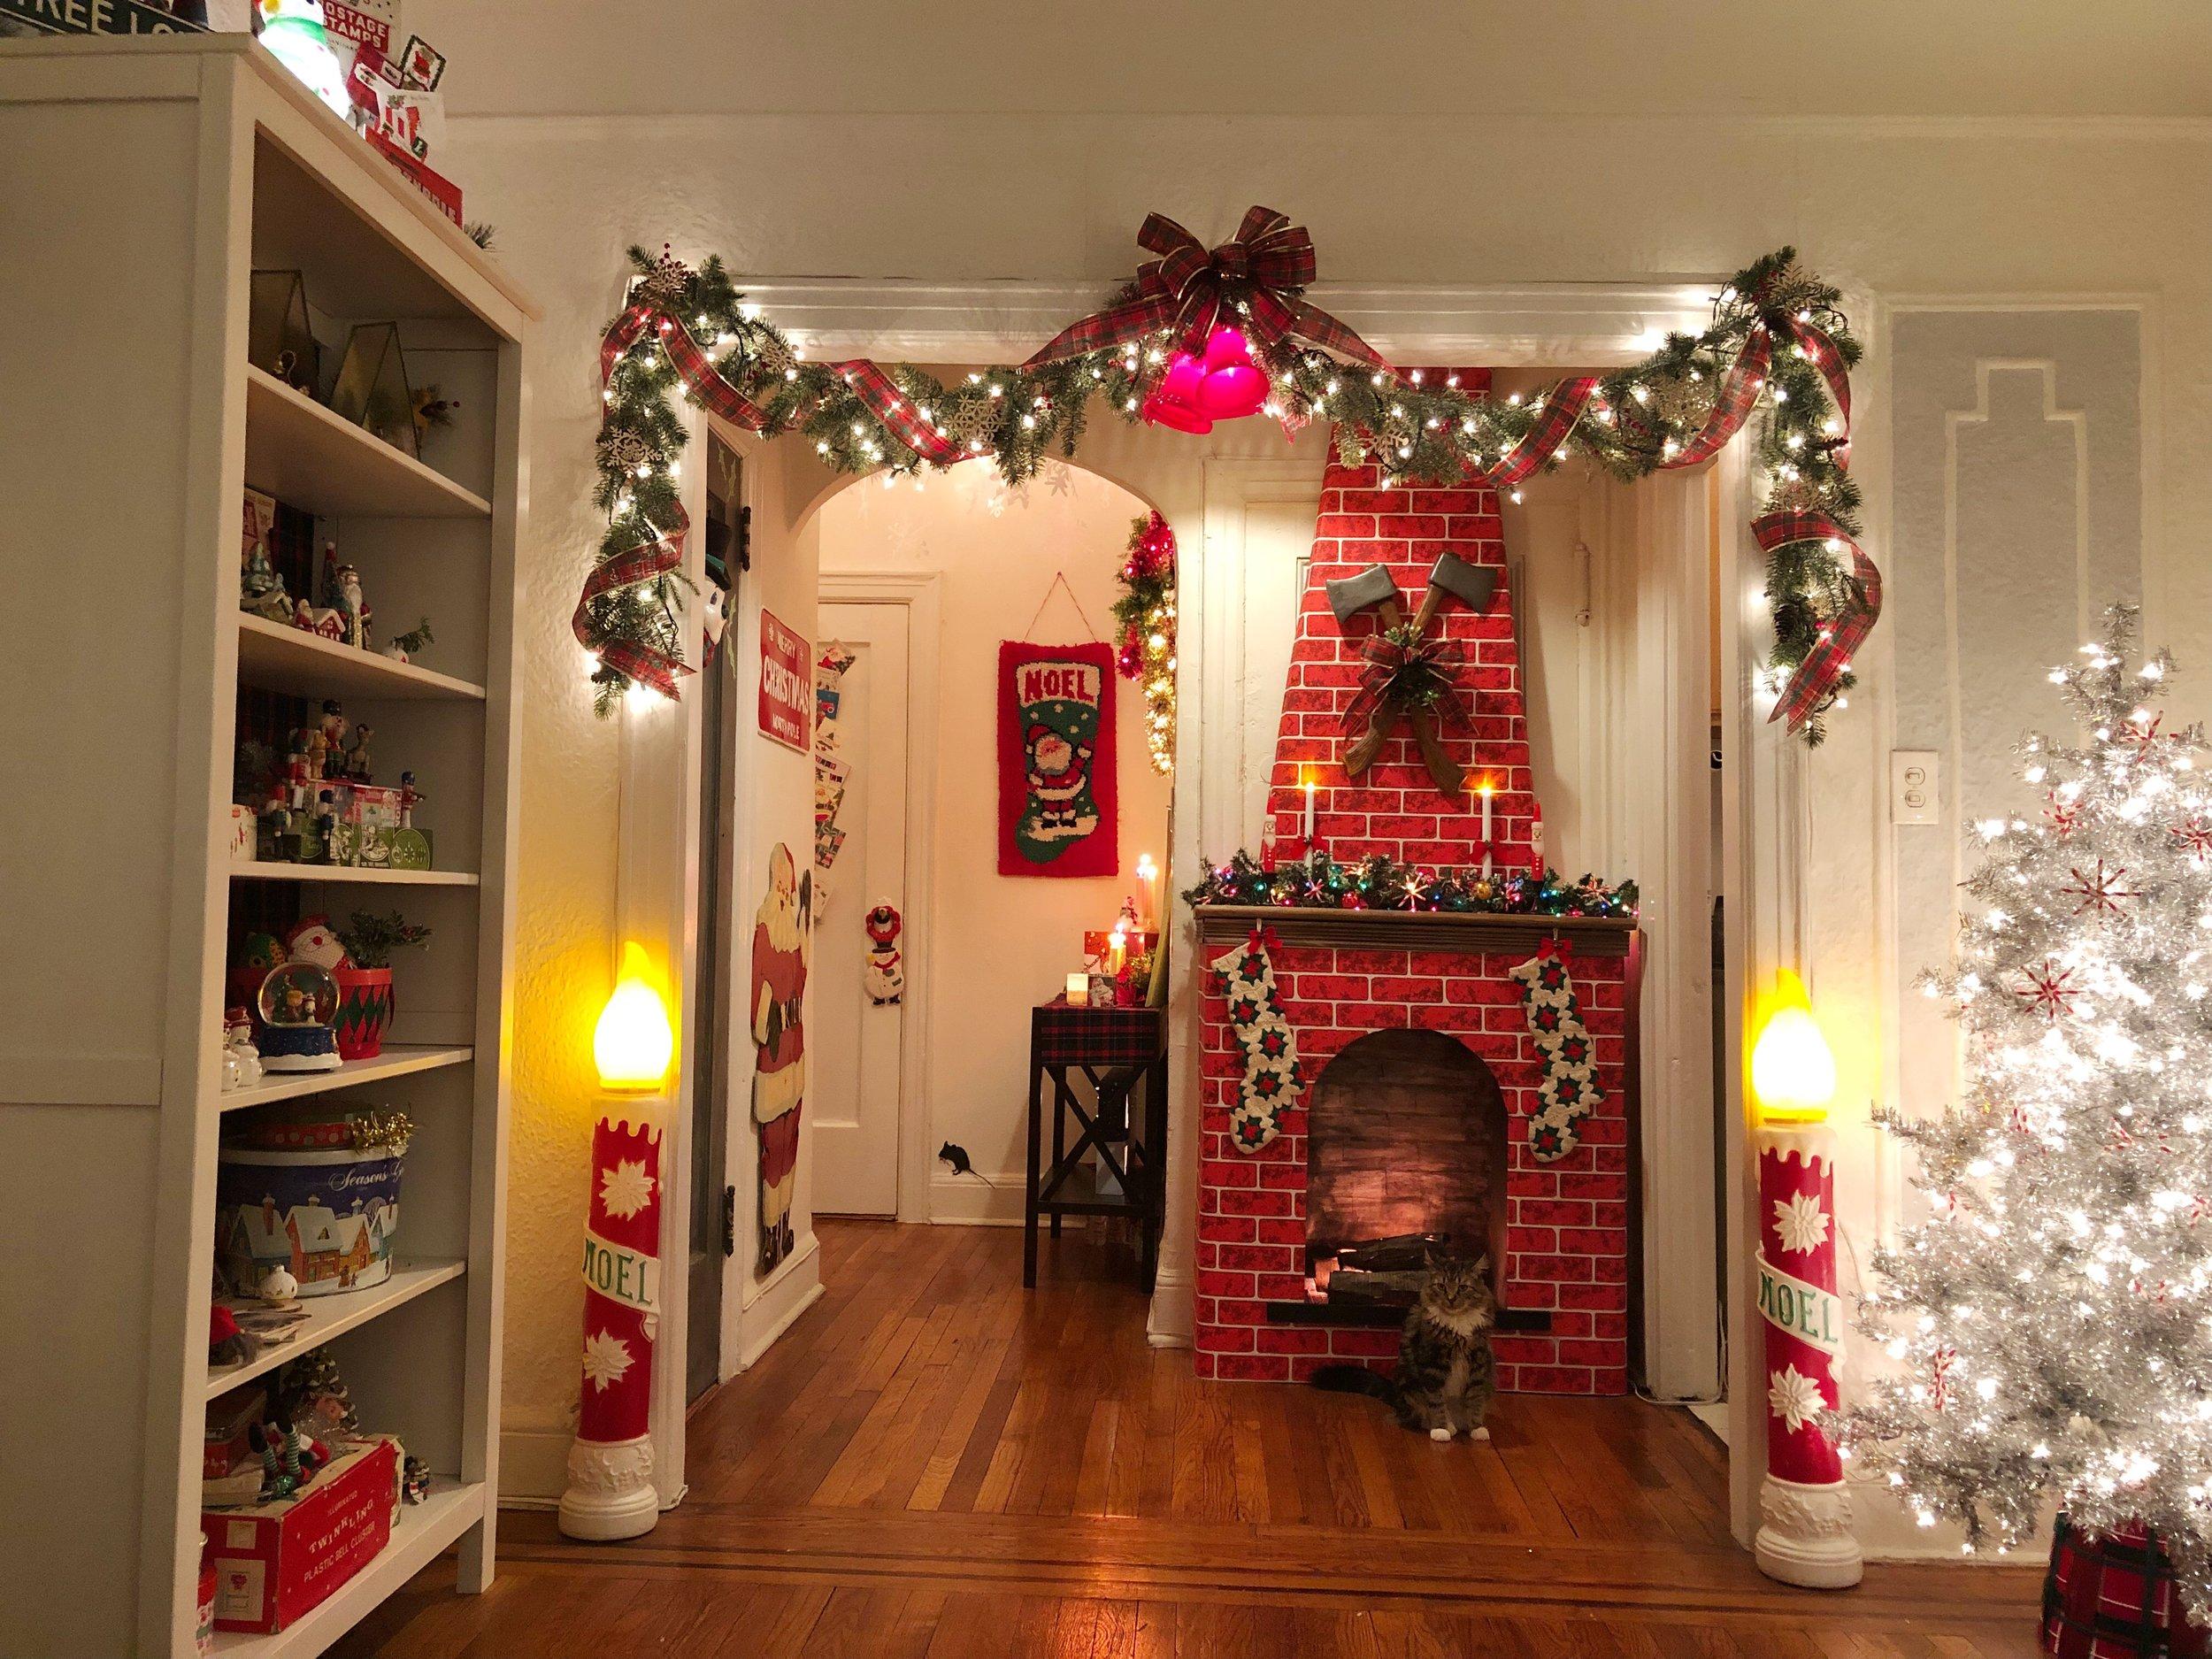 Christmas Apartment Tour - Astoria, Queens, New York - NYC #VintageChristmas #ChristmasDIY #KitschyChristmas